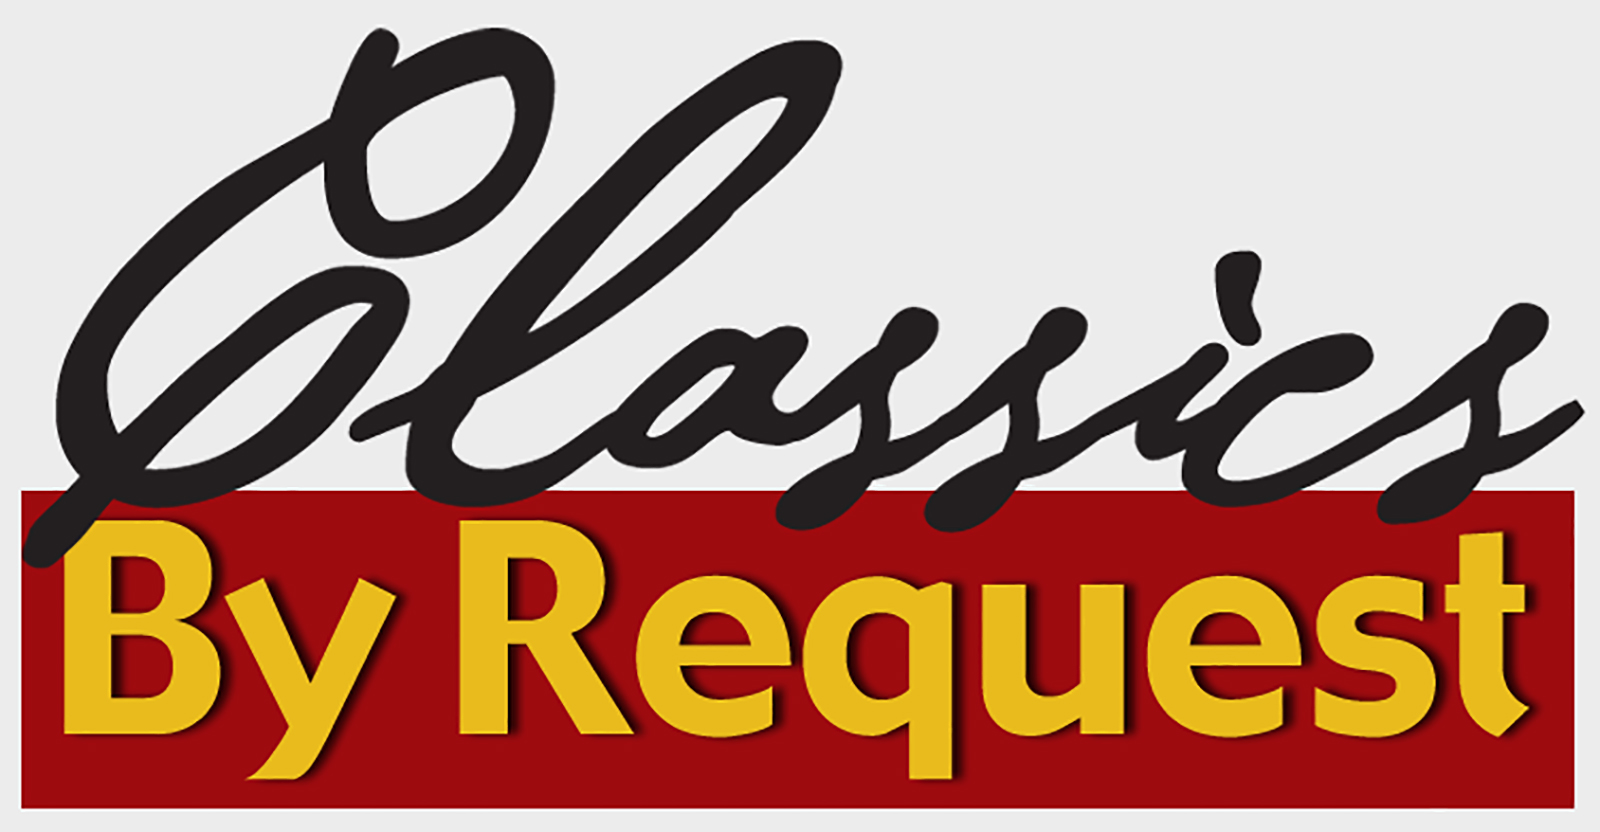 <b>Classics by Request</b>